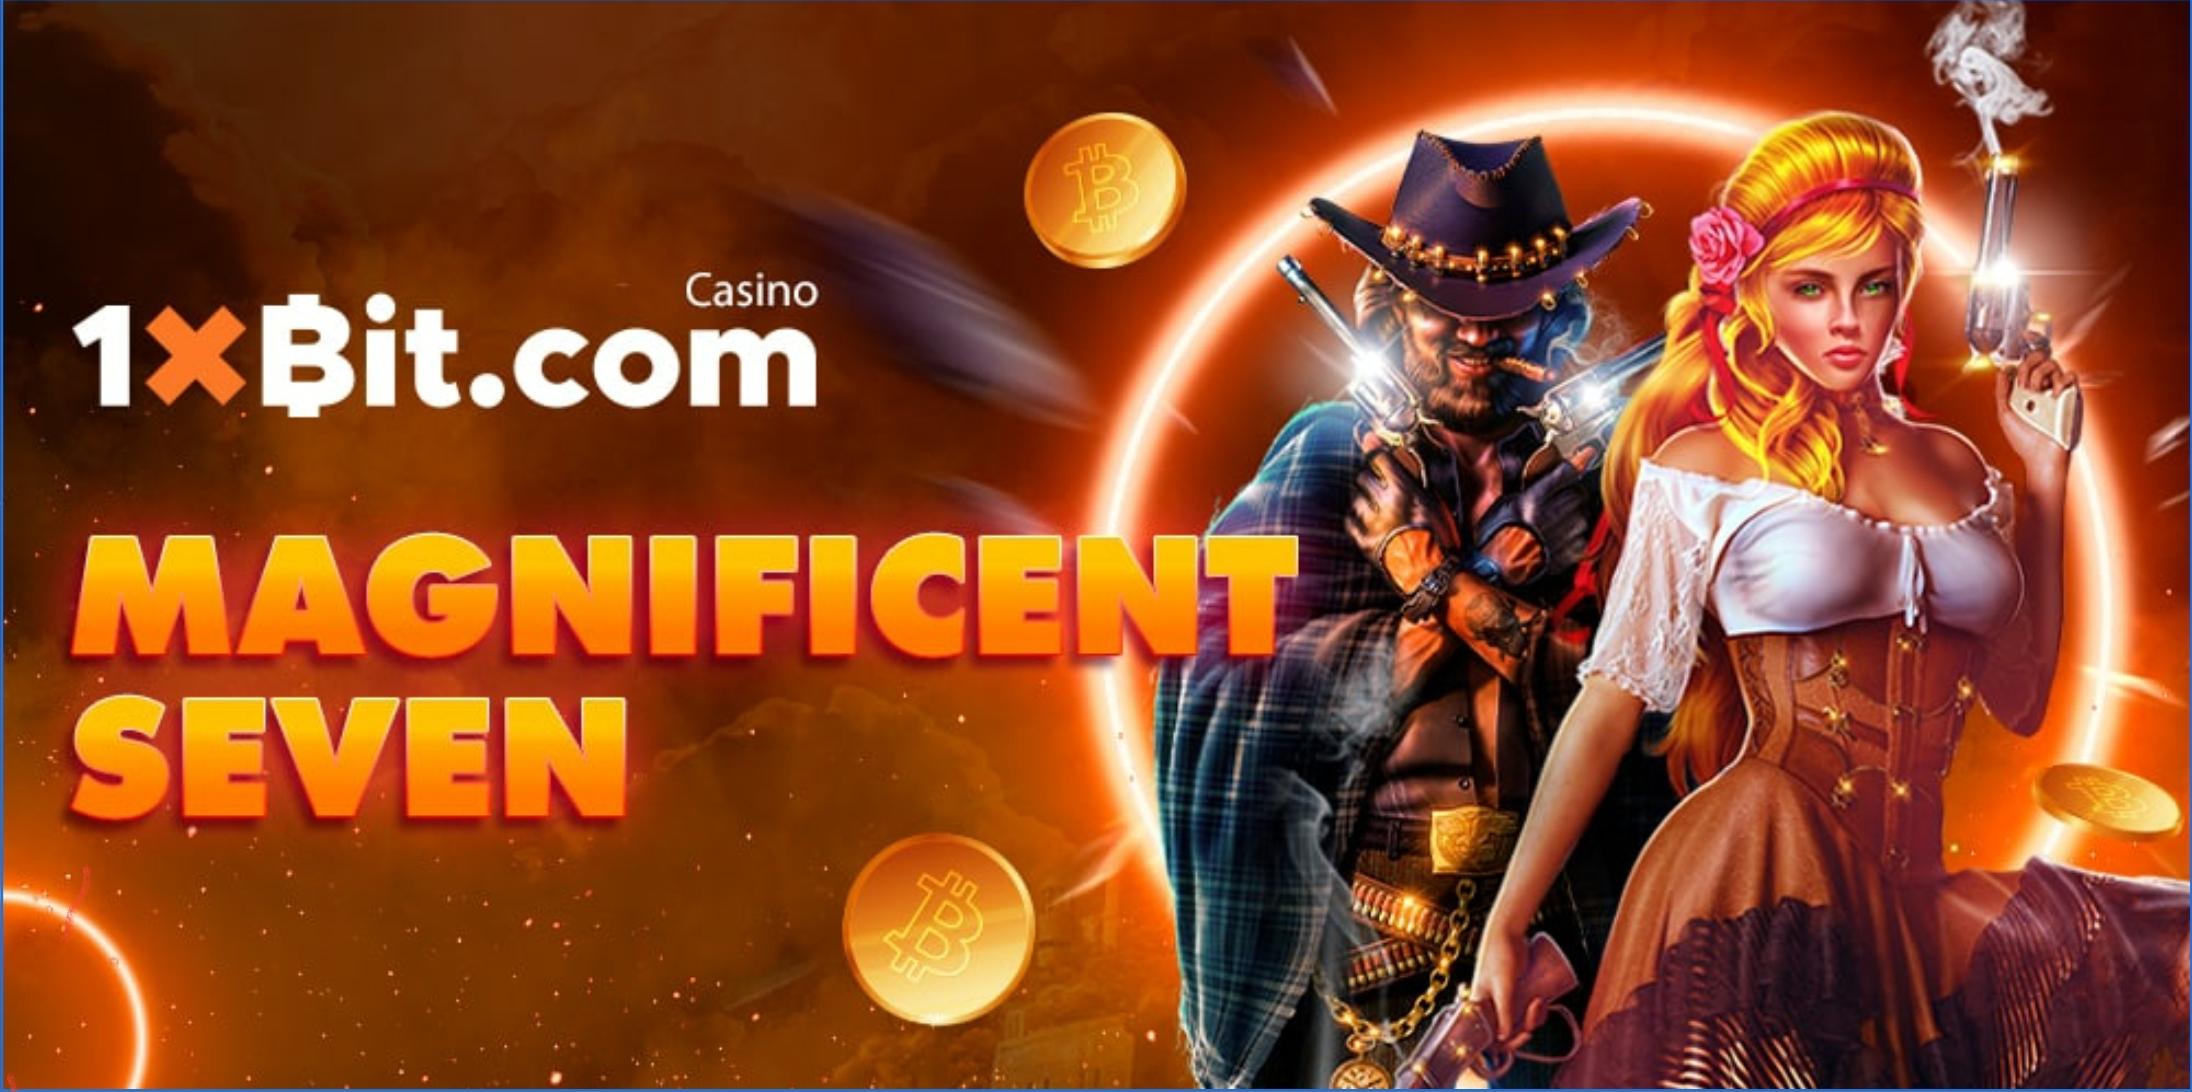 1xBit Introduces New Casino Slot Tournament MAGNIFICENT SEVEN